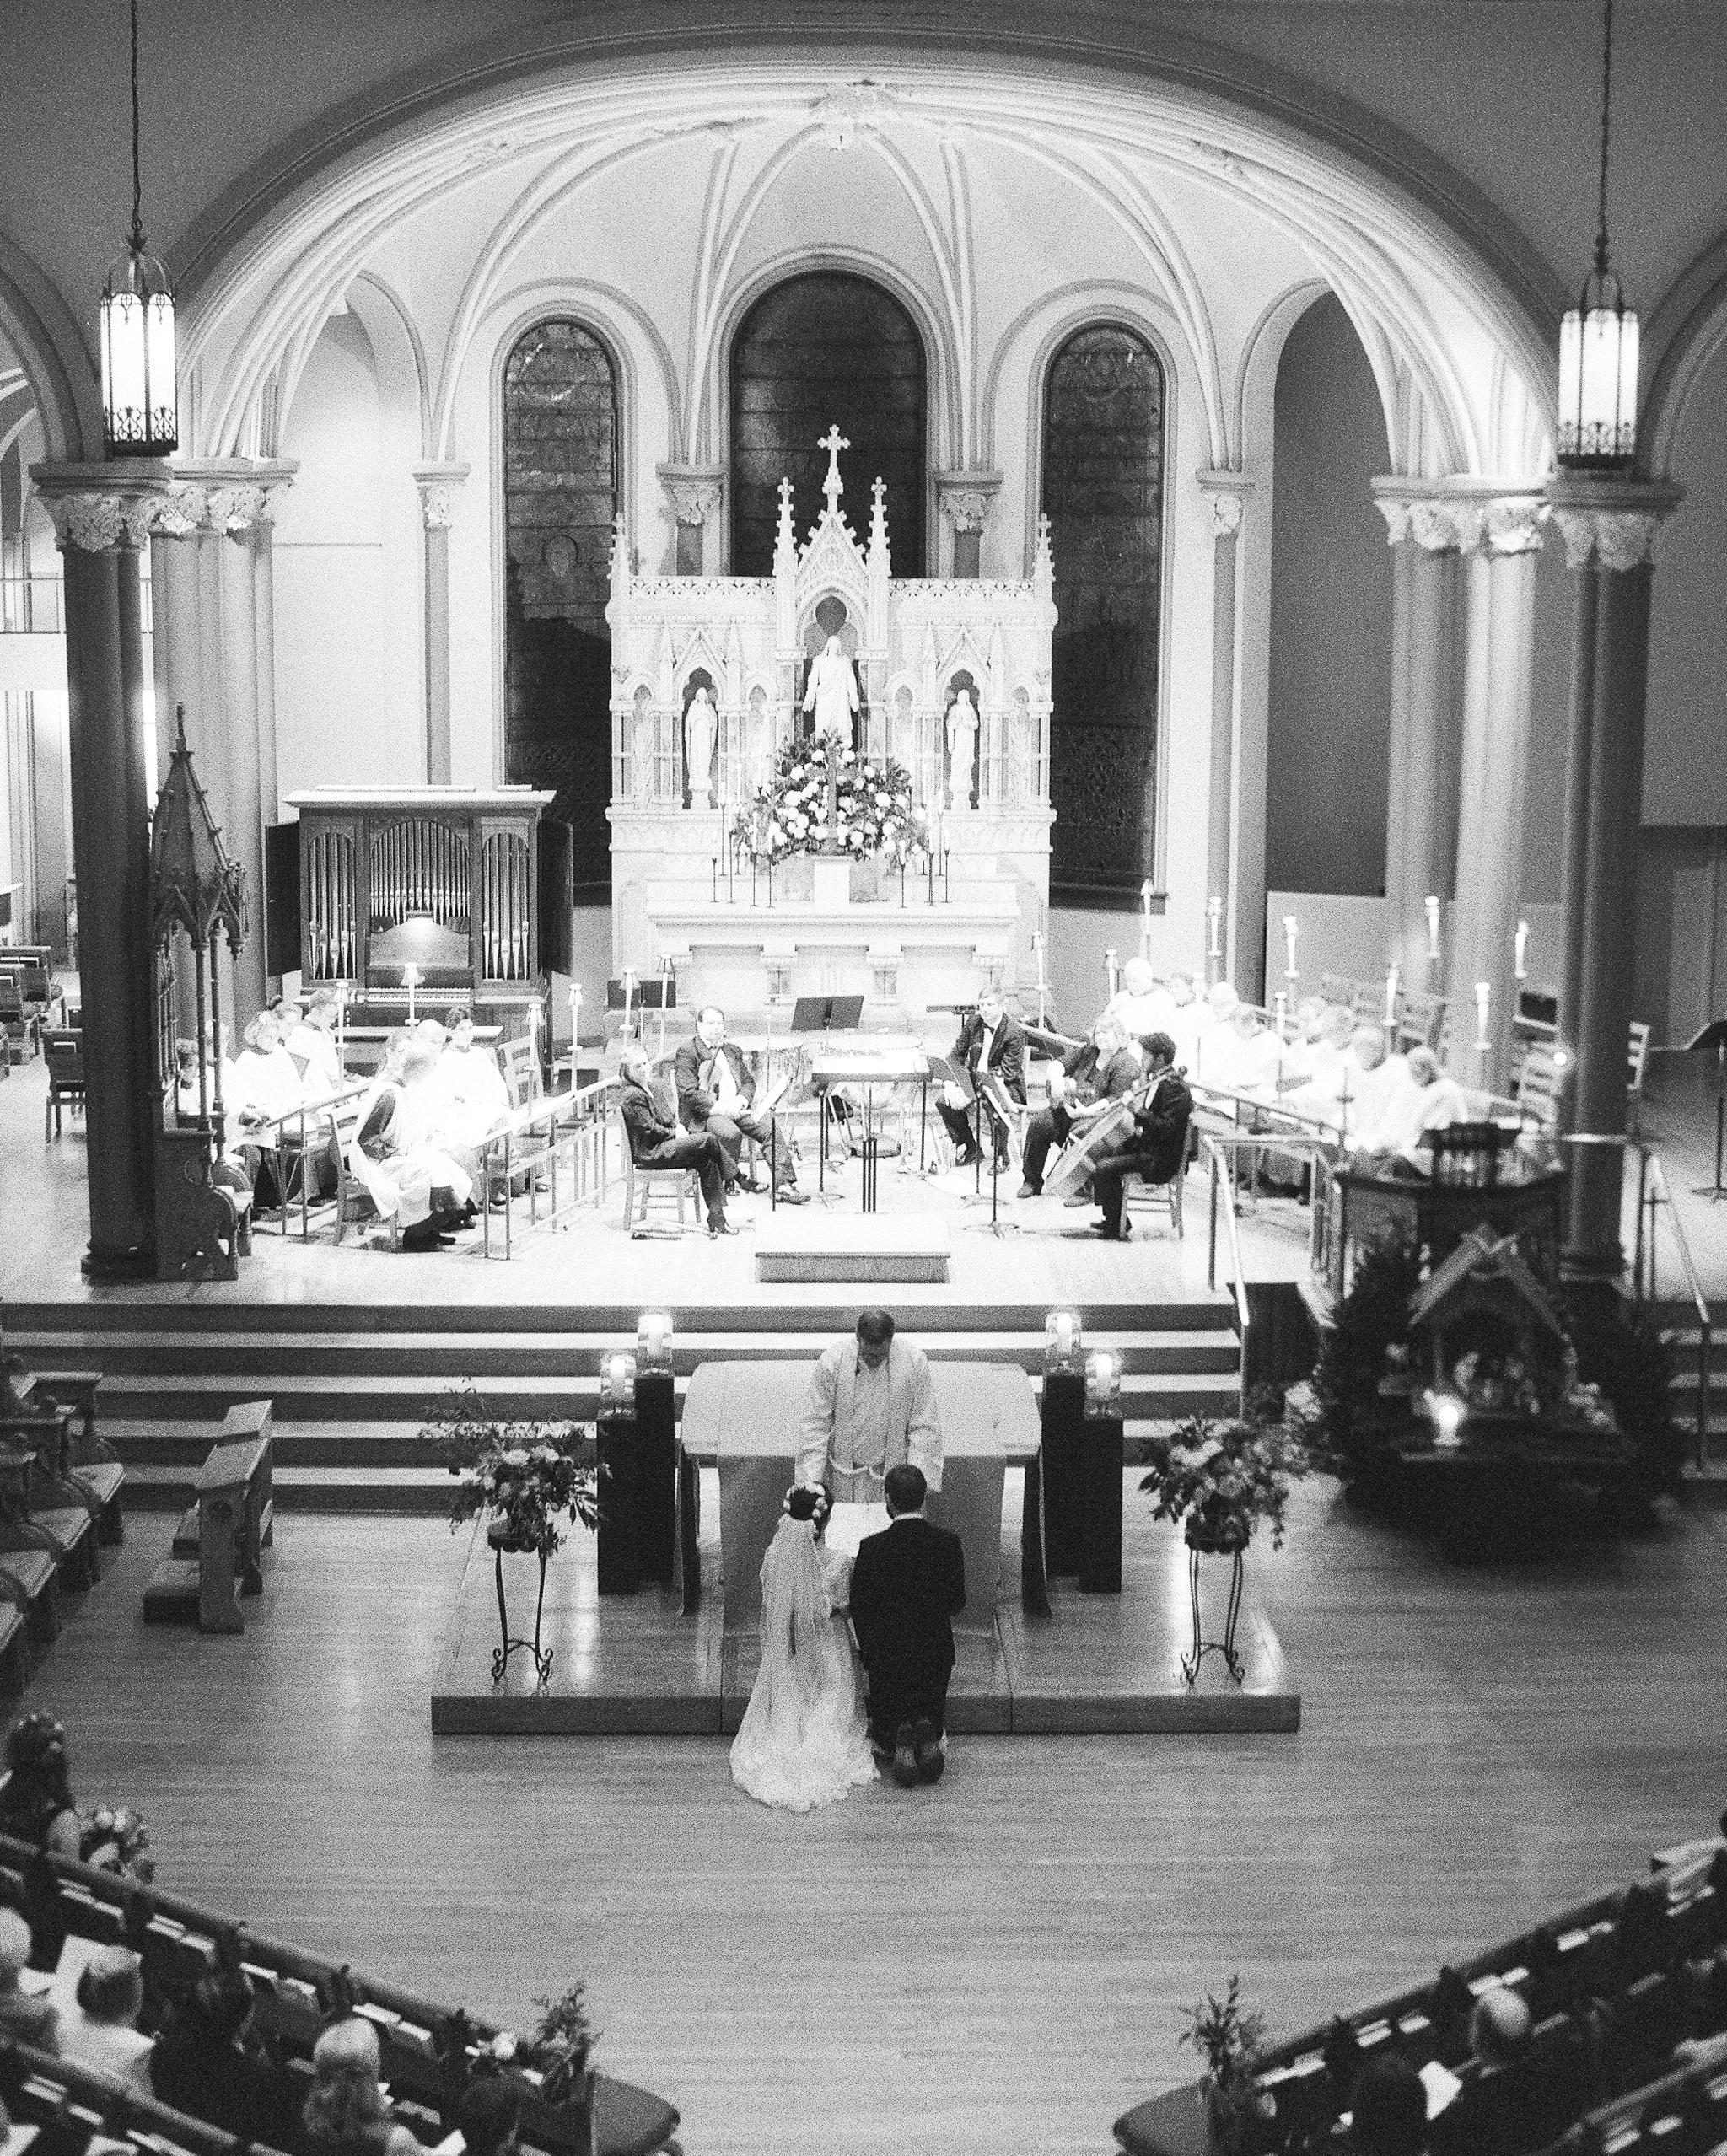 sidney-dane-wedding-ceremony-261-s112109-0815.jpg